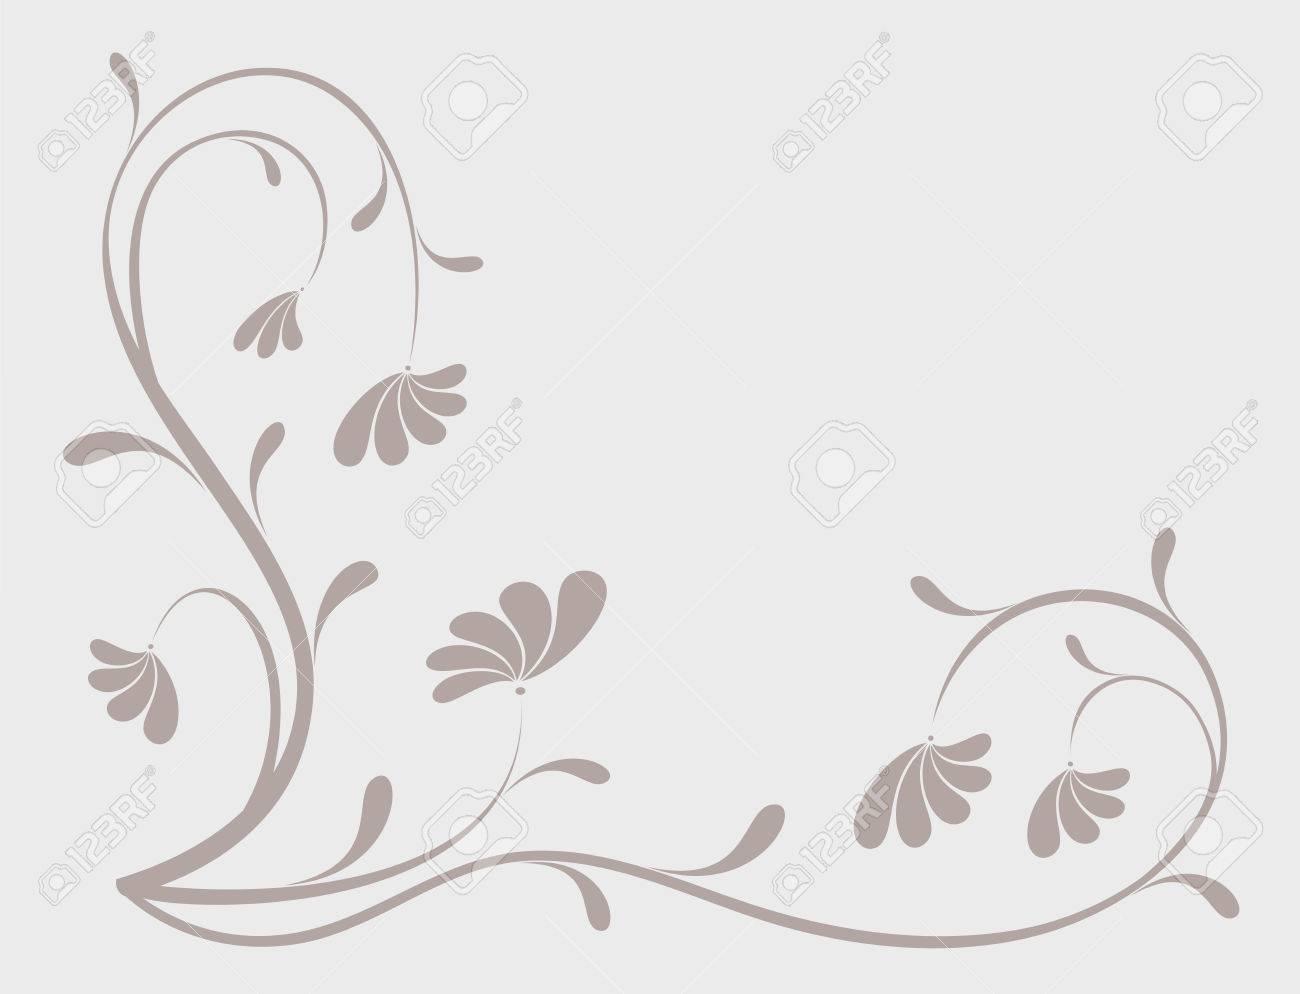 Grunge paint flower background, element for design, vector illustration Stock Vector - 2772237